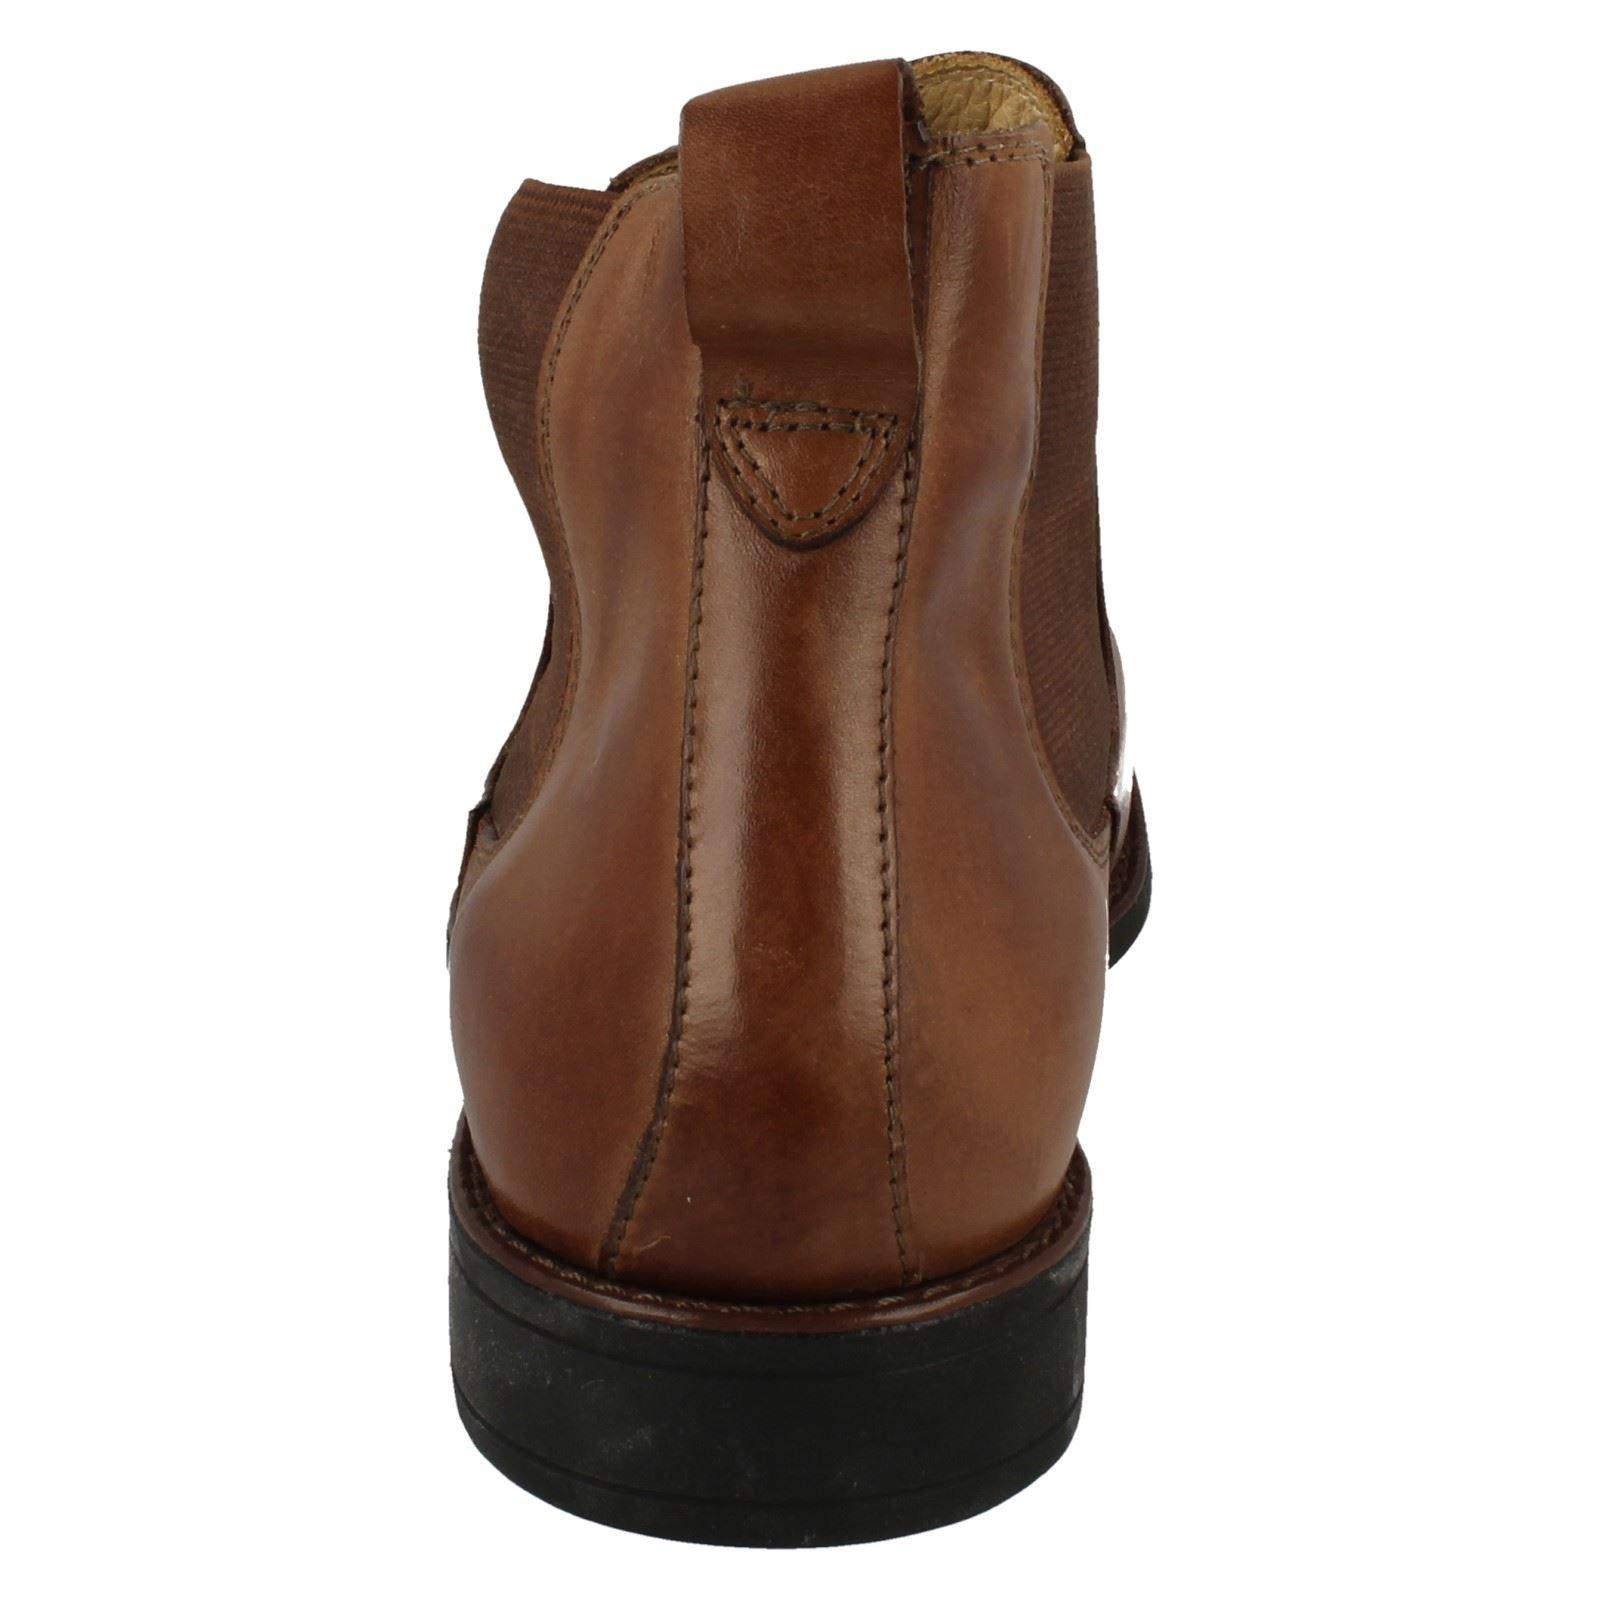 Mens-Anatomic-Chelsea-Boots-039-929211LB-039 thumbnail 12